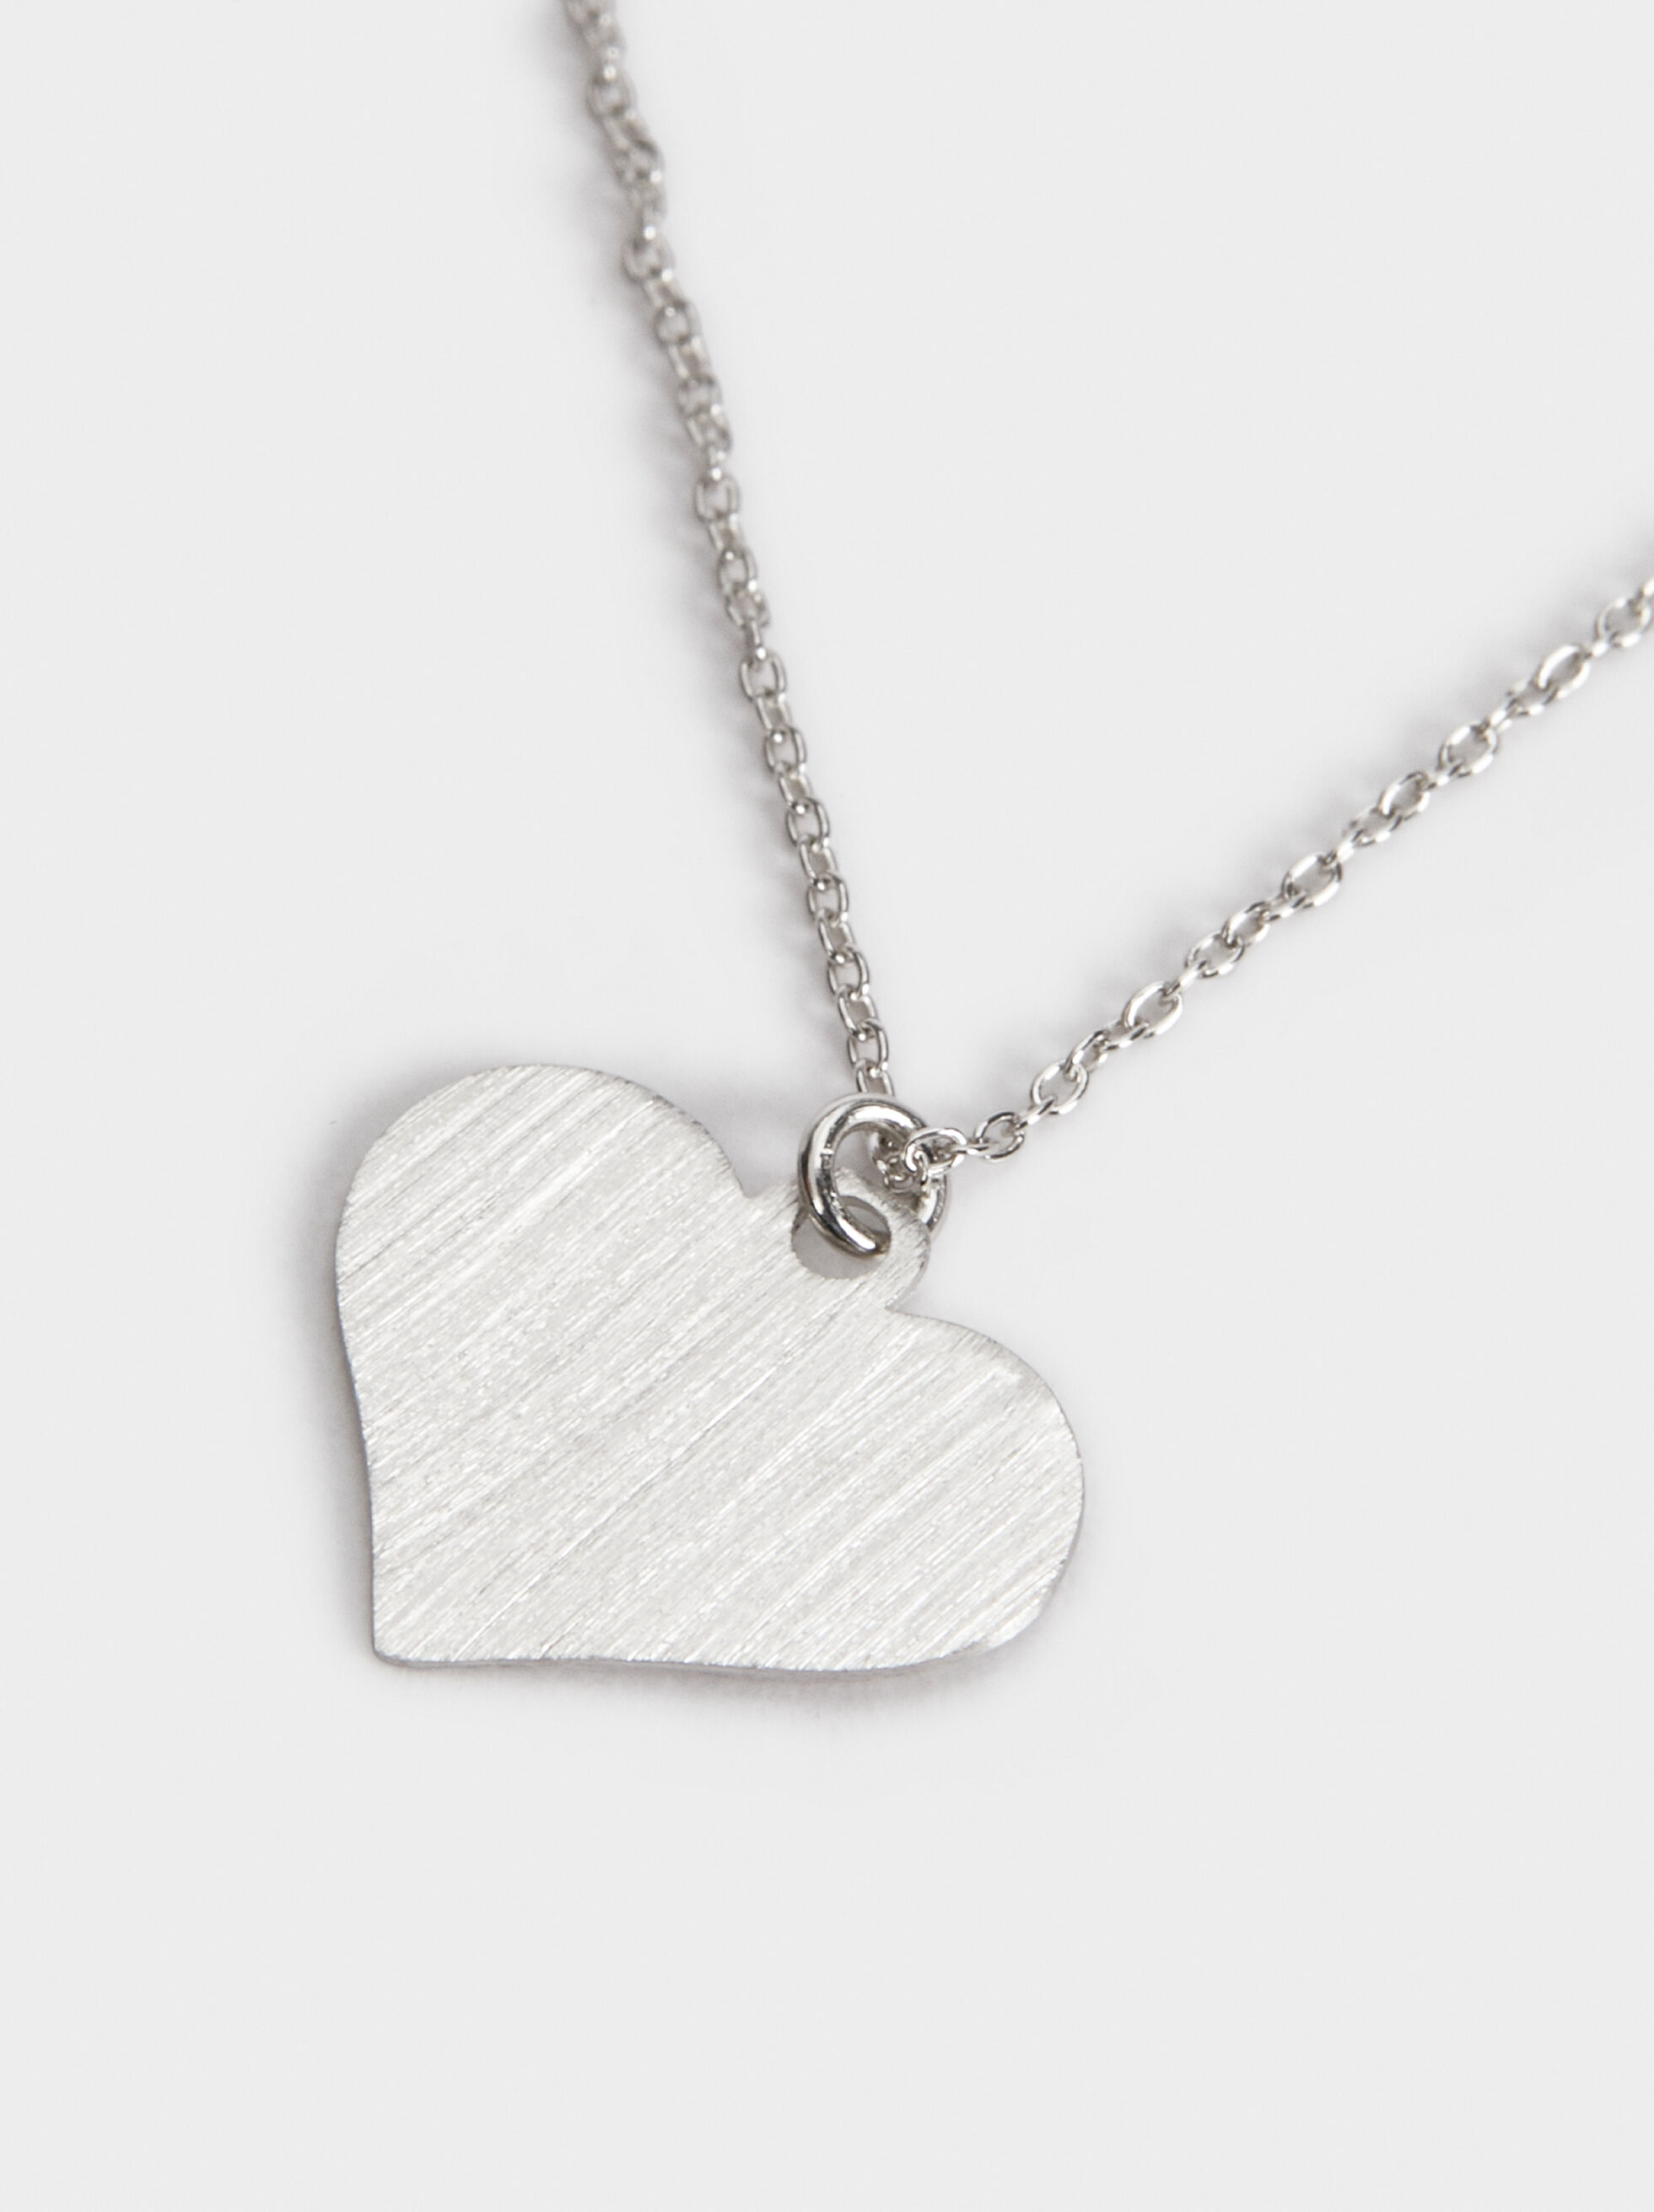 Short Silver 925 Heart Necklace, Silver, hi-res